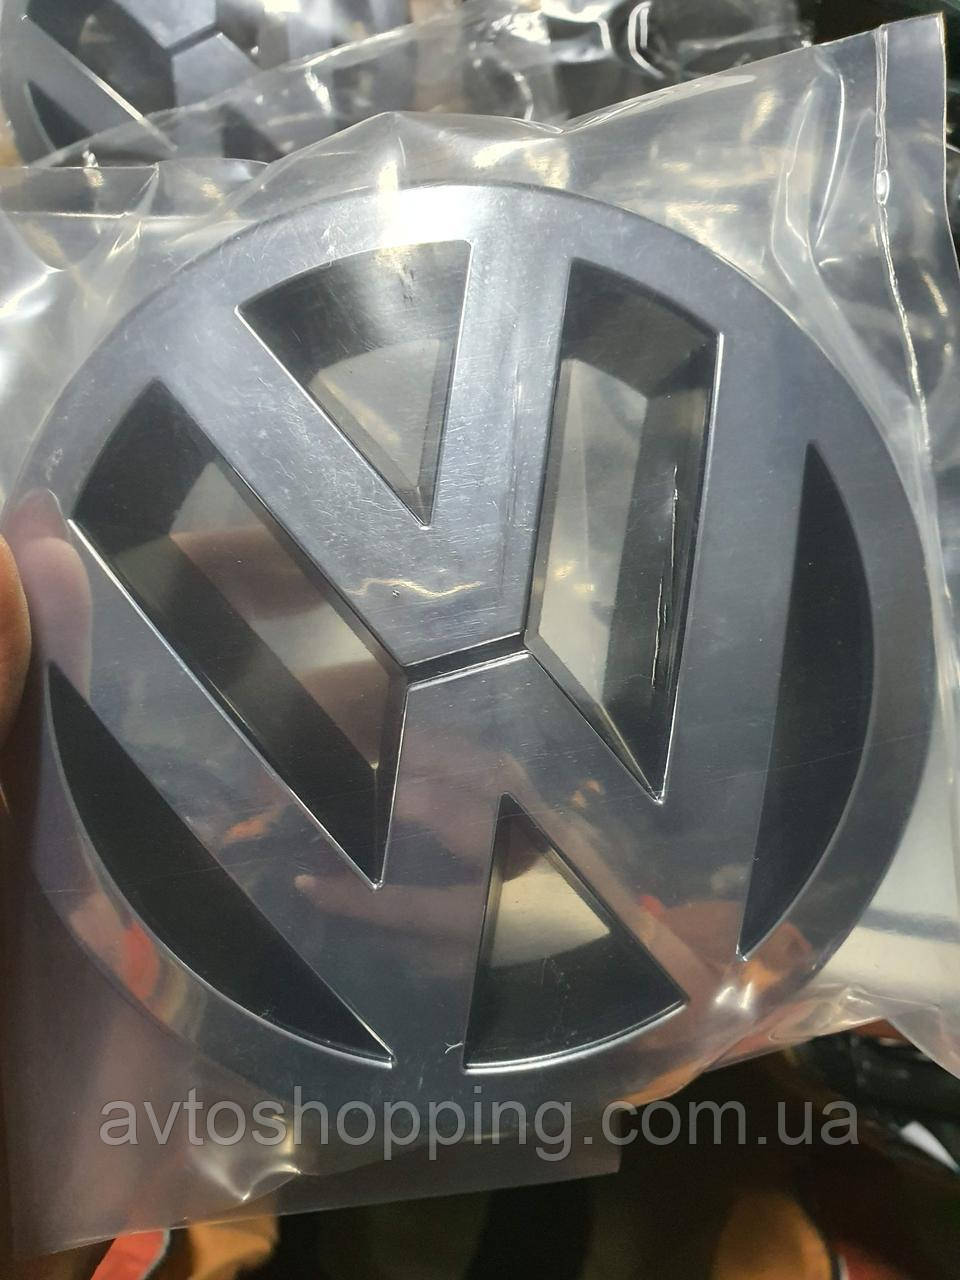 Емблема значок на решітку радіатора Volkswagen VW PASSAT B6, 13 см